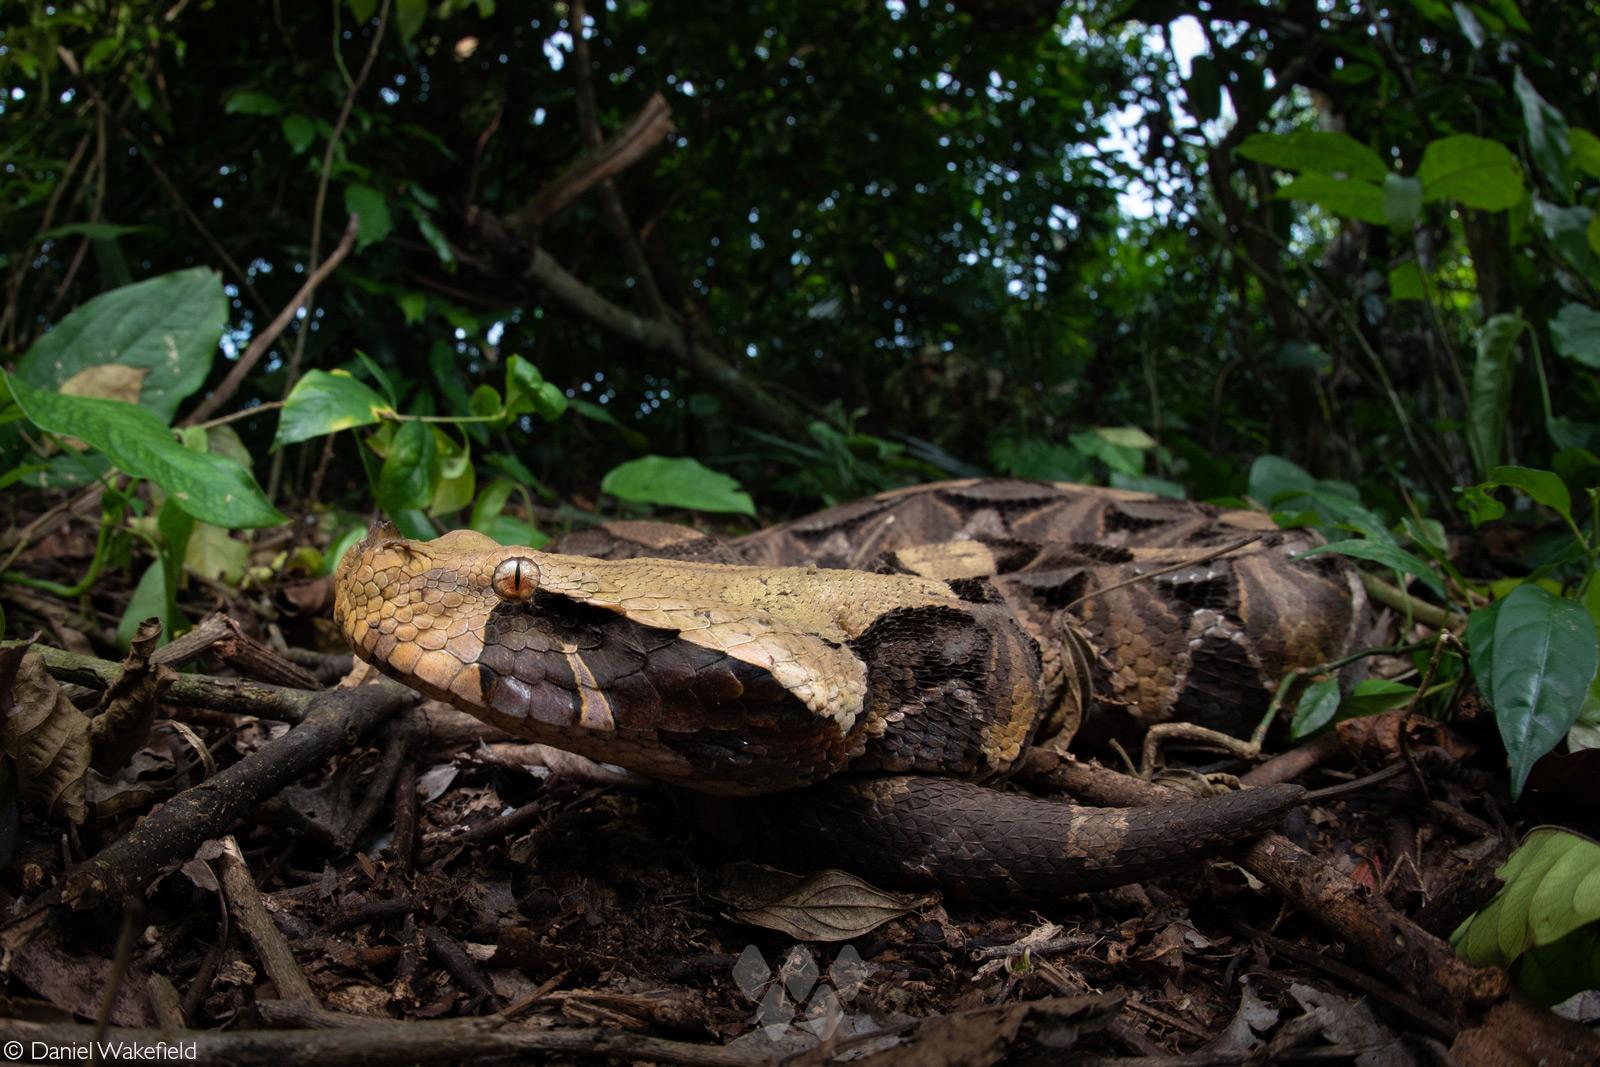 A large adult gaboon viper (Bitis gabonica) in a rainforest. West of Kampala, Uganda © Daniel Wakefield